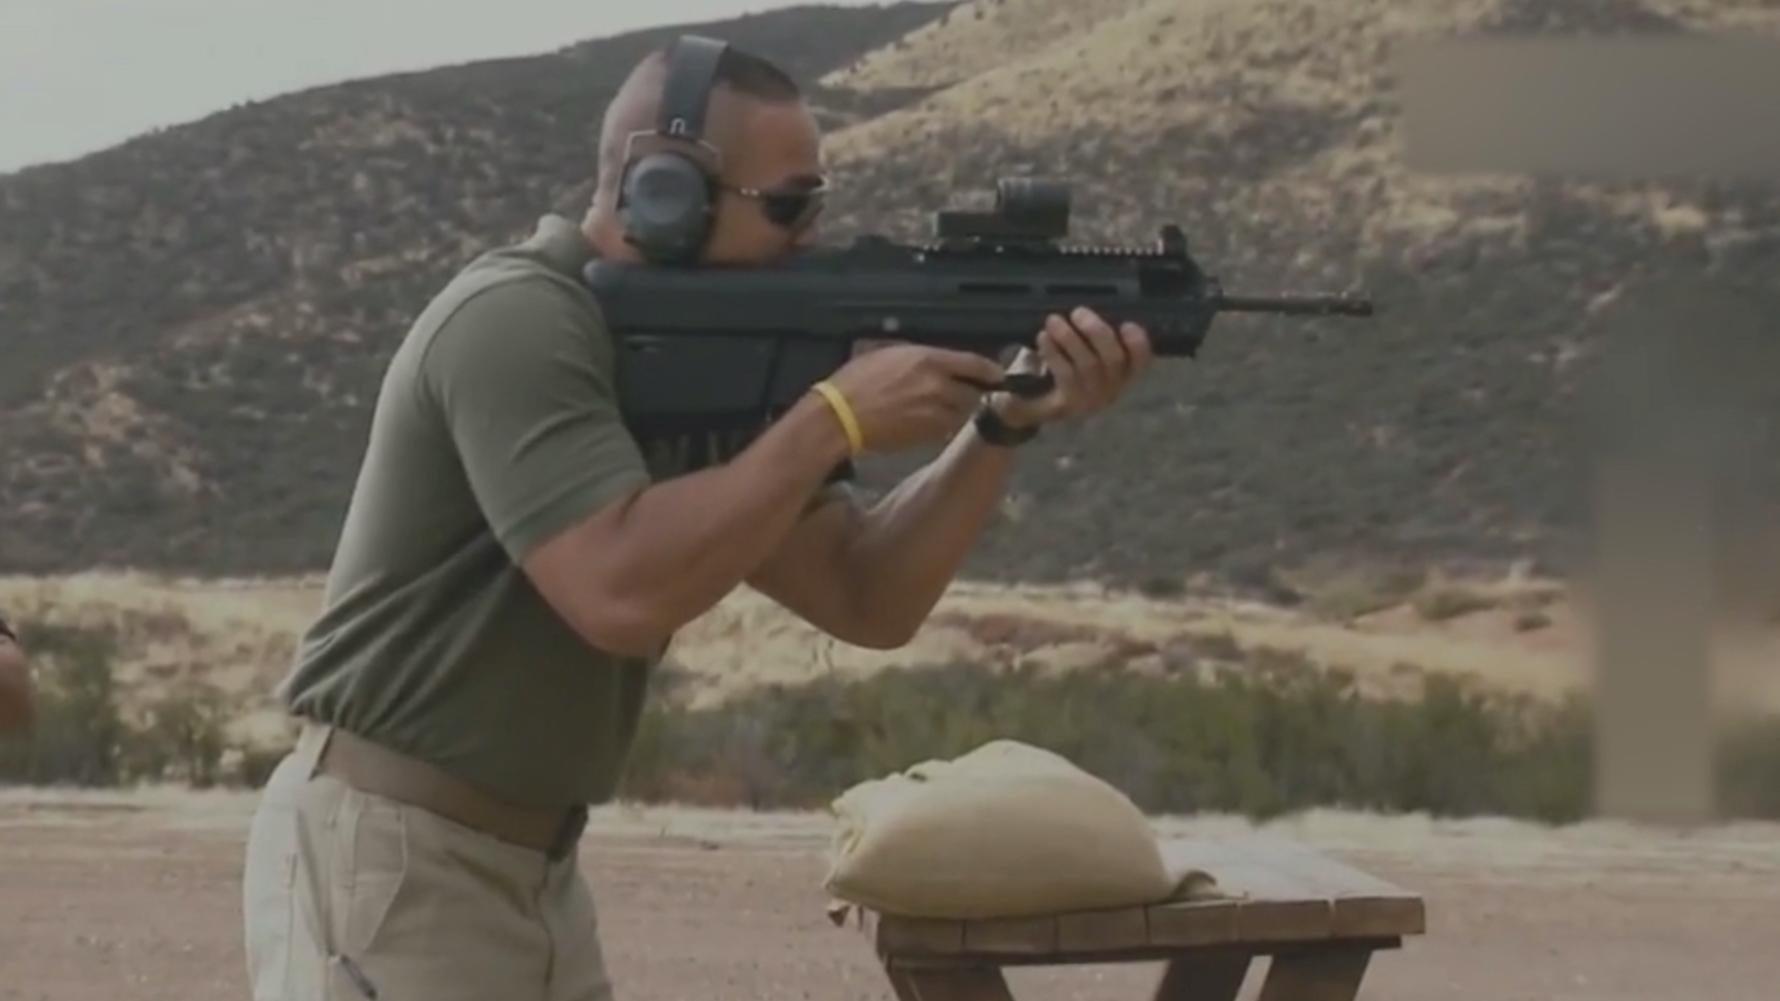 FN FS2000威力测试,4个水壶能打穿几个?